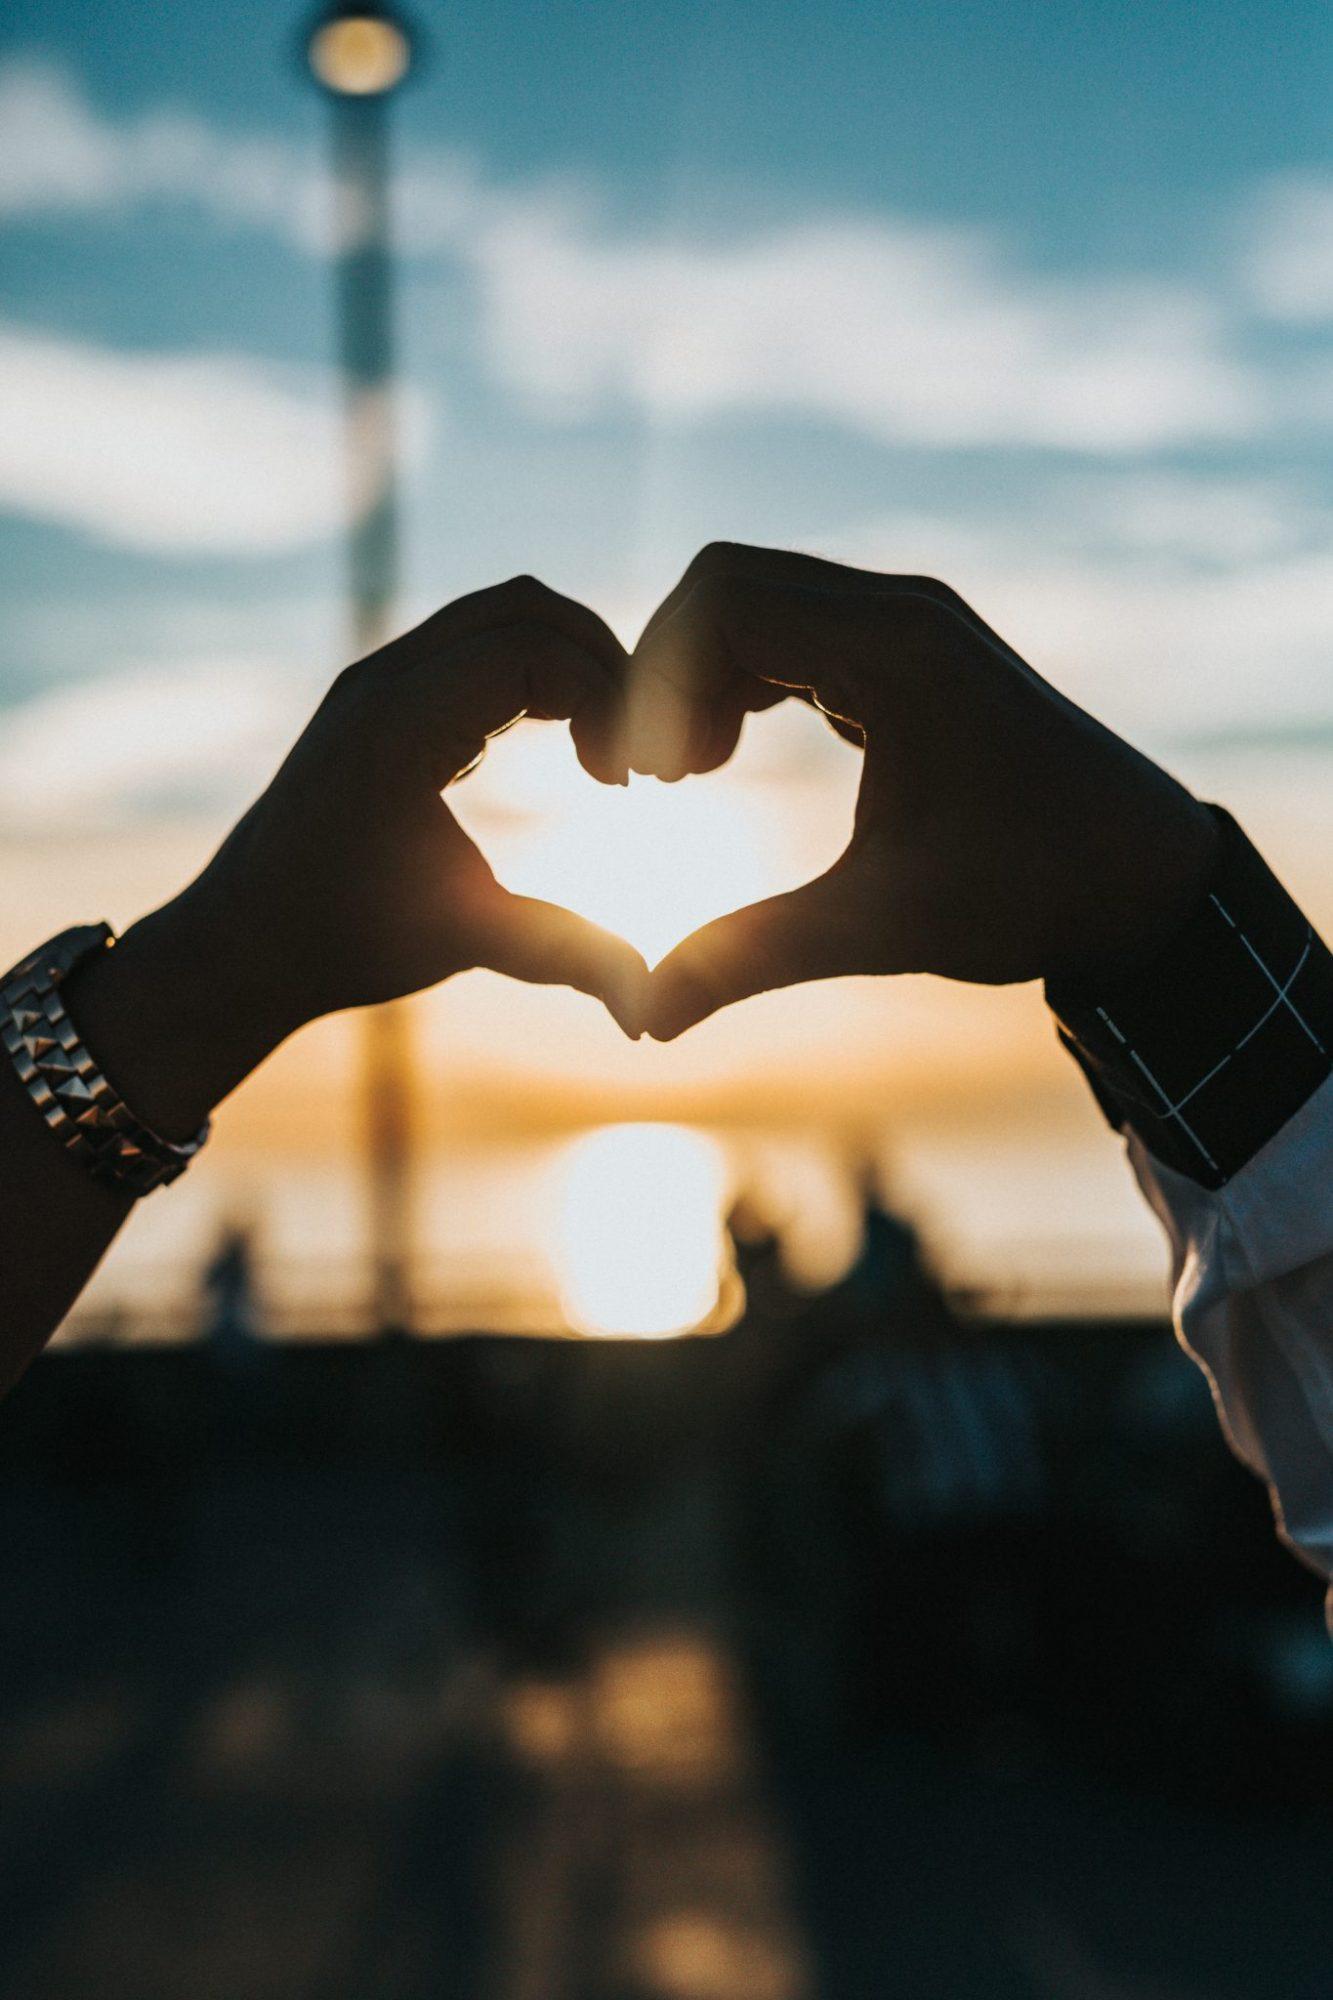 Liefde, diagnose & leven met MS